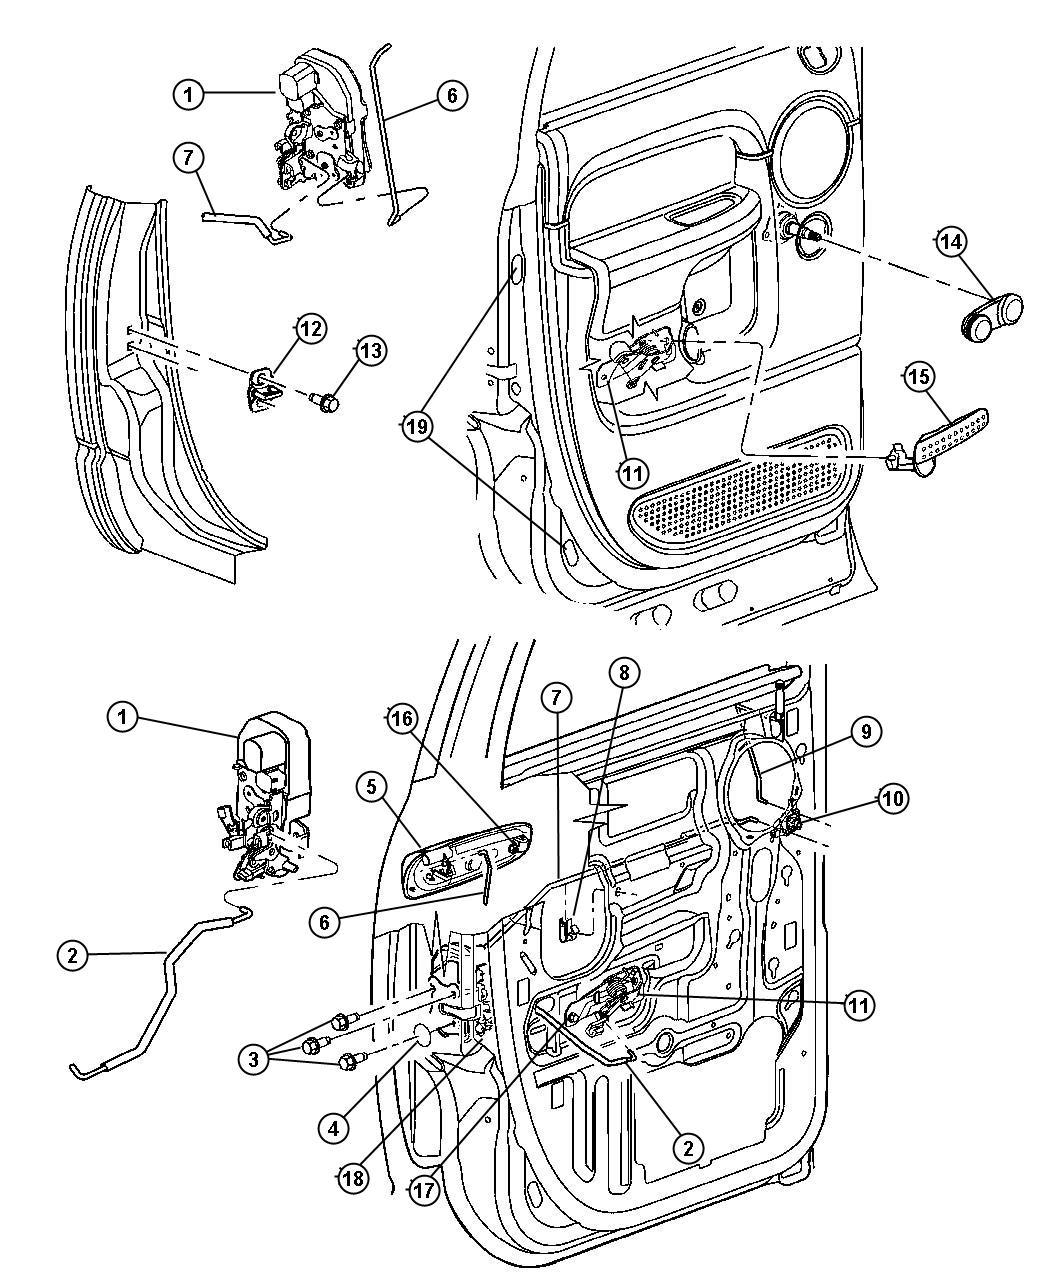 Dodge Ram Handle Window Regulator Used For